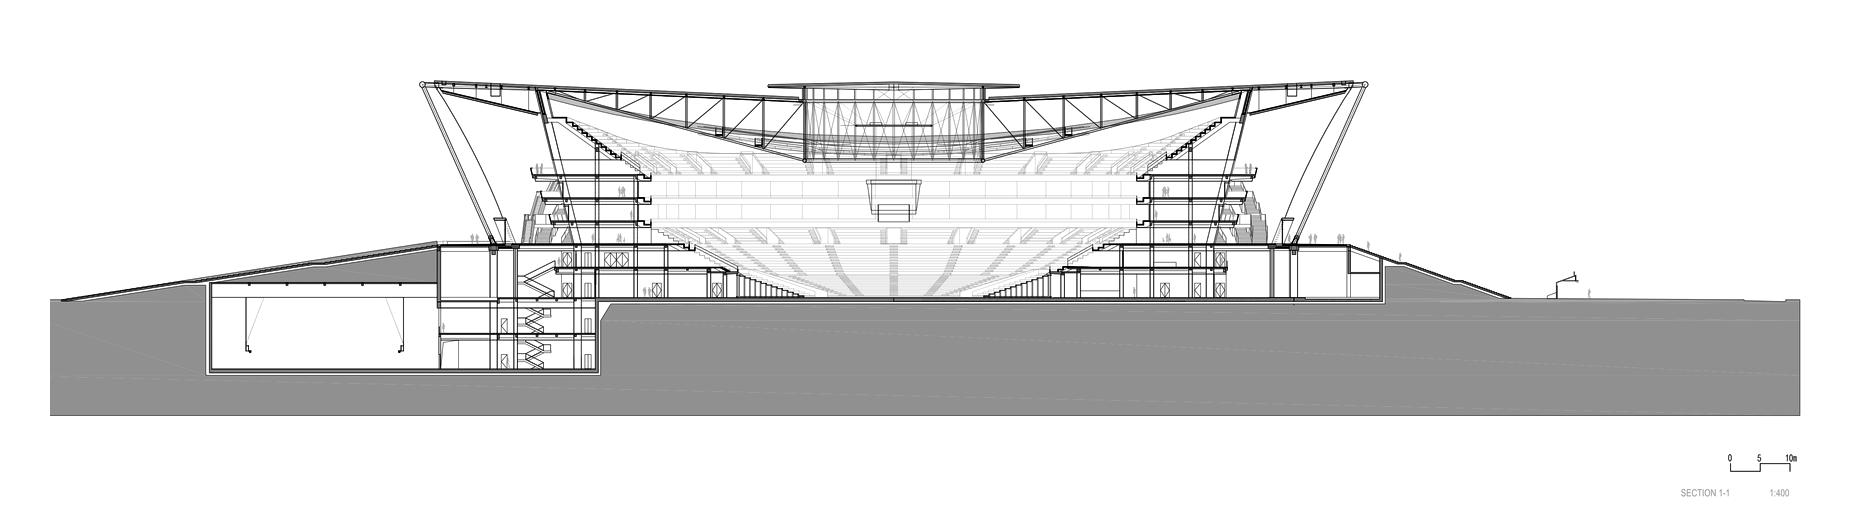 Estadio de Baloncesto en Dongguan / gmp architekten. Corte Longitudinal